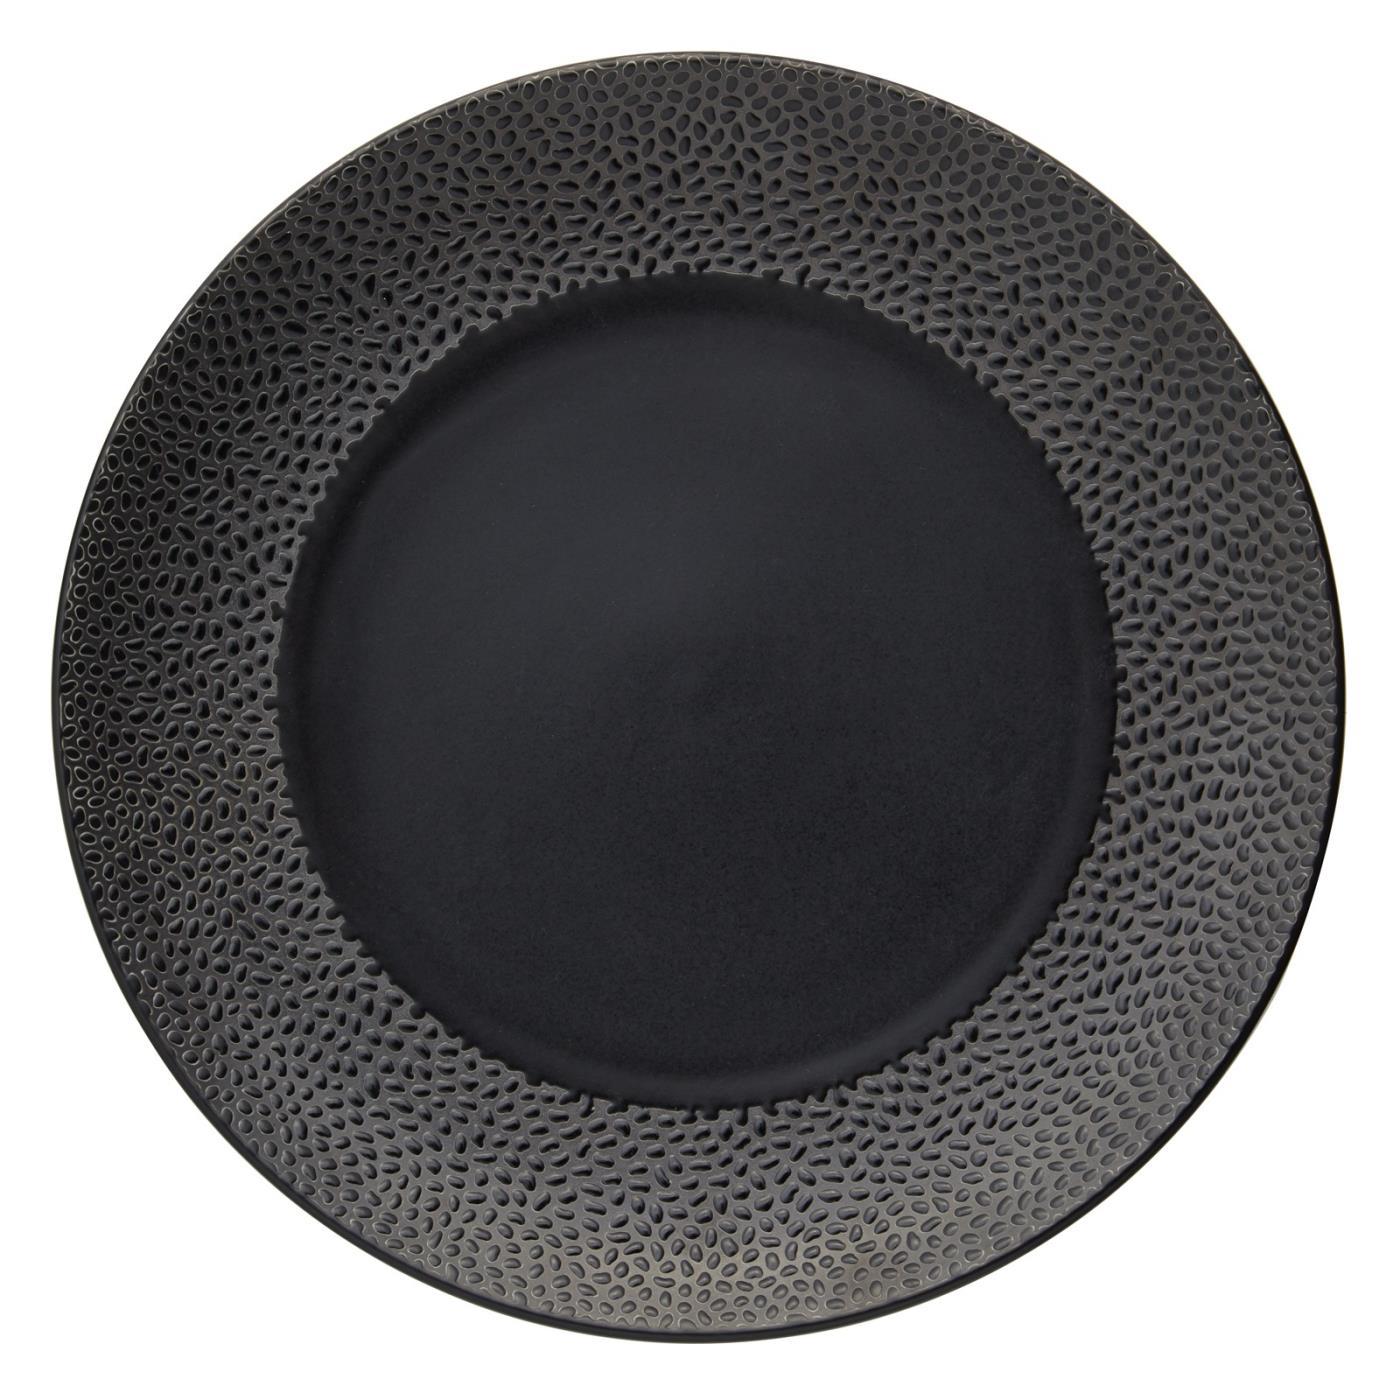 Pebble Dinner Plate 10.75